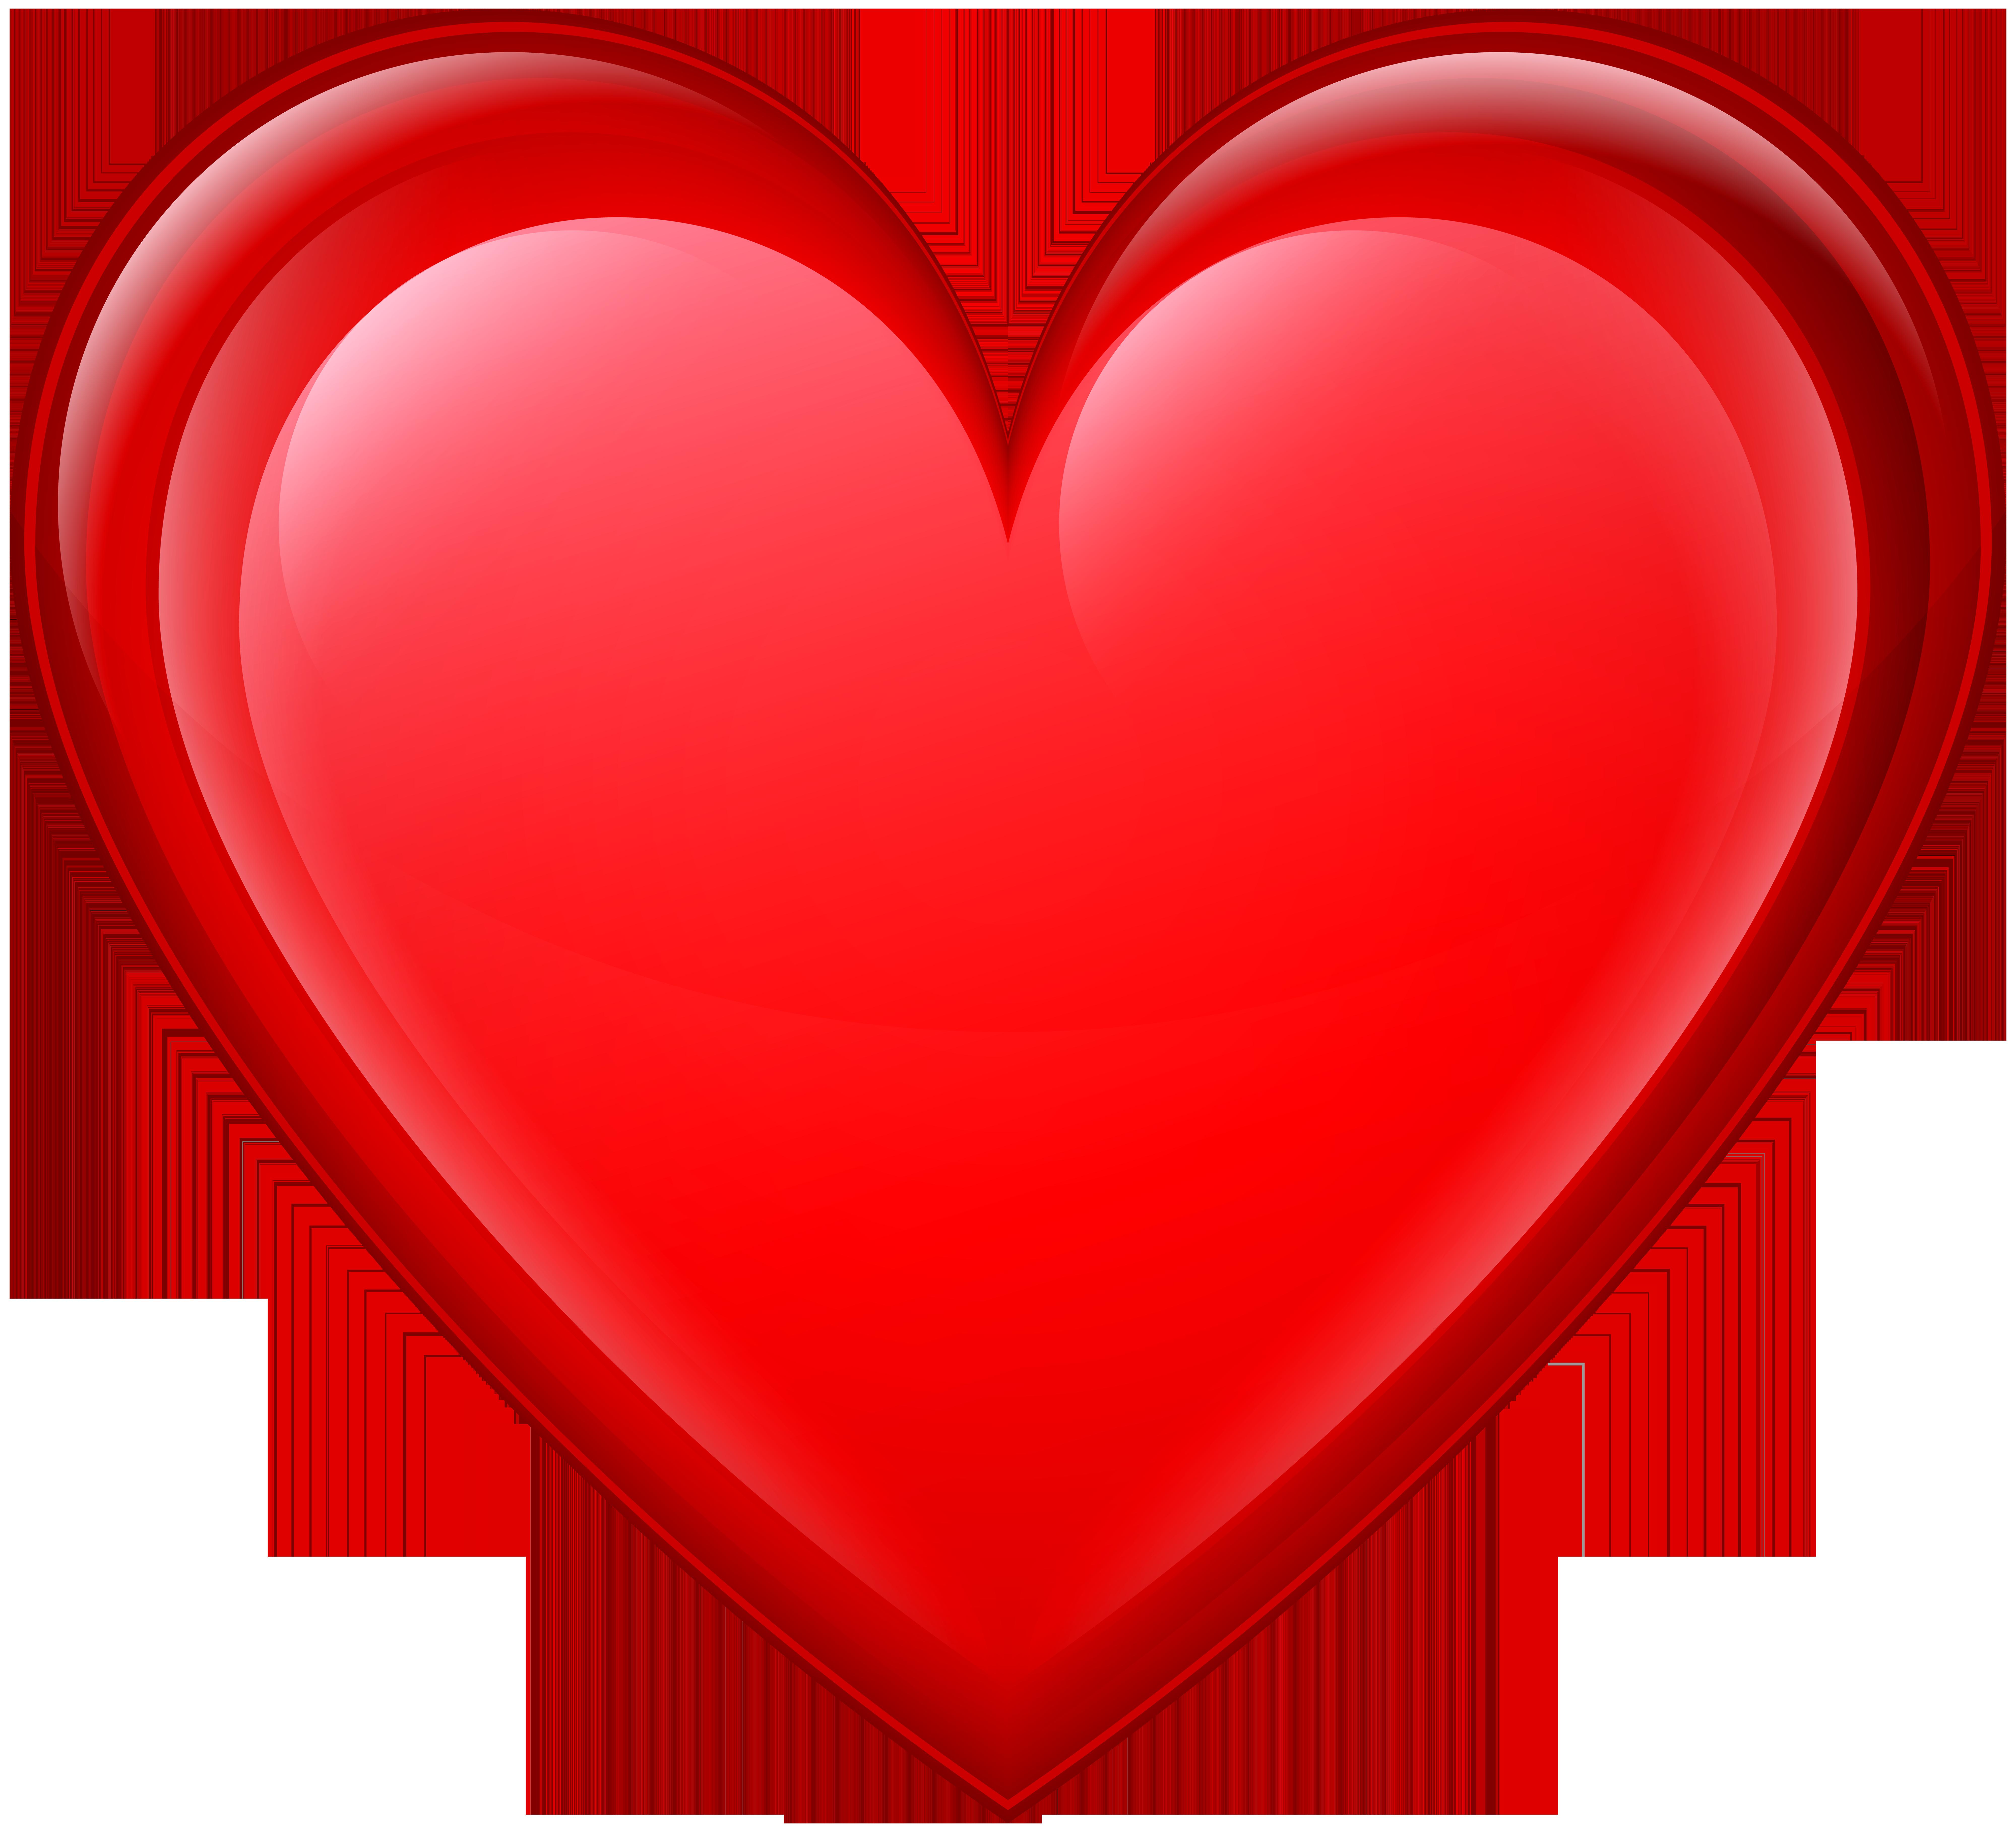 8000x7271 Heart Red Png Transparent Clip Art Imageu200b Gallery Yopriceville